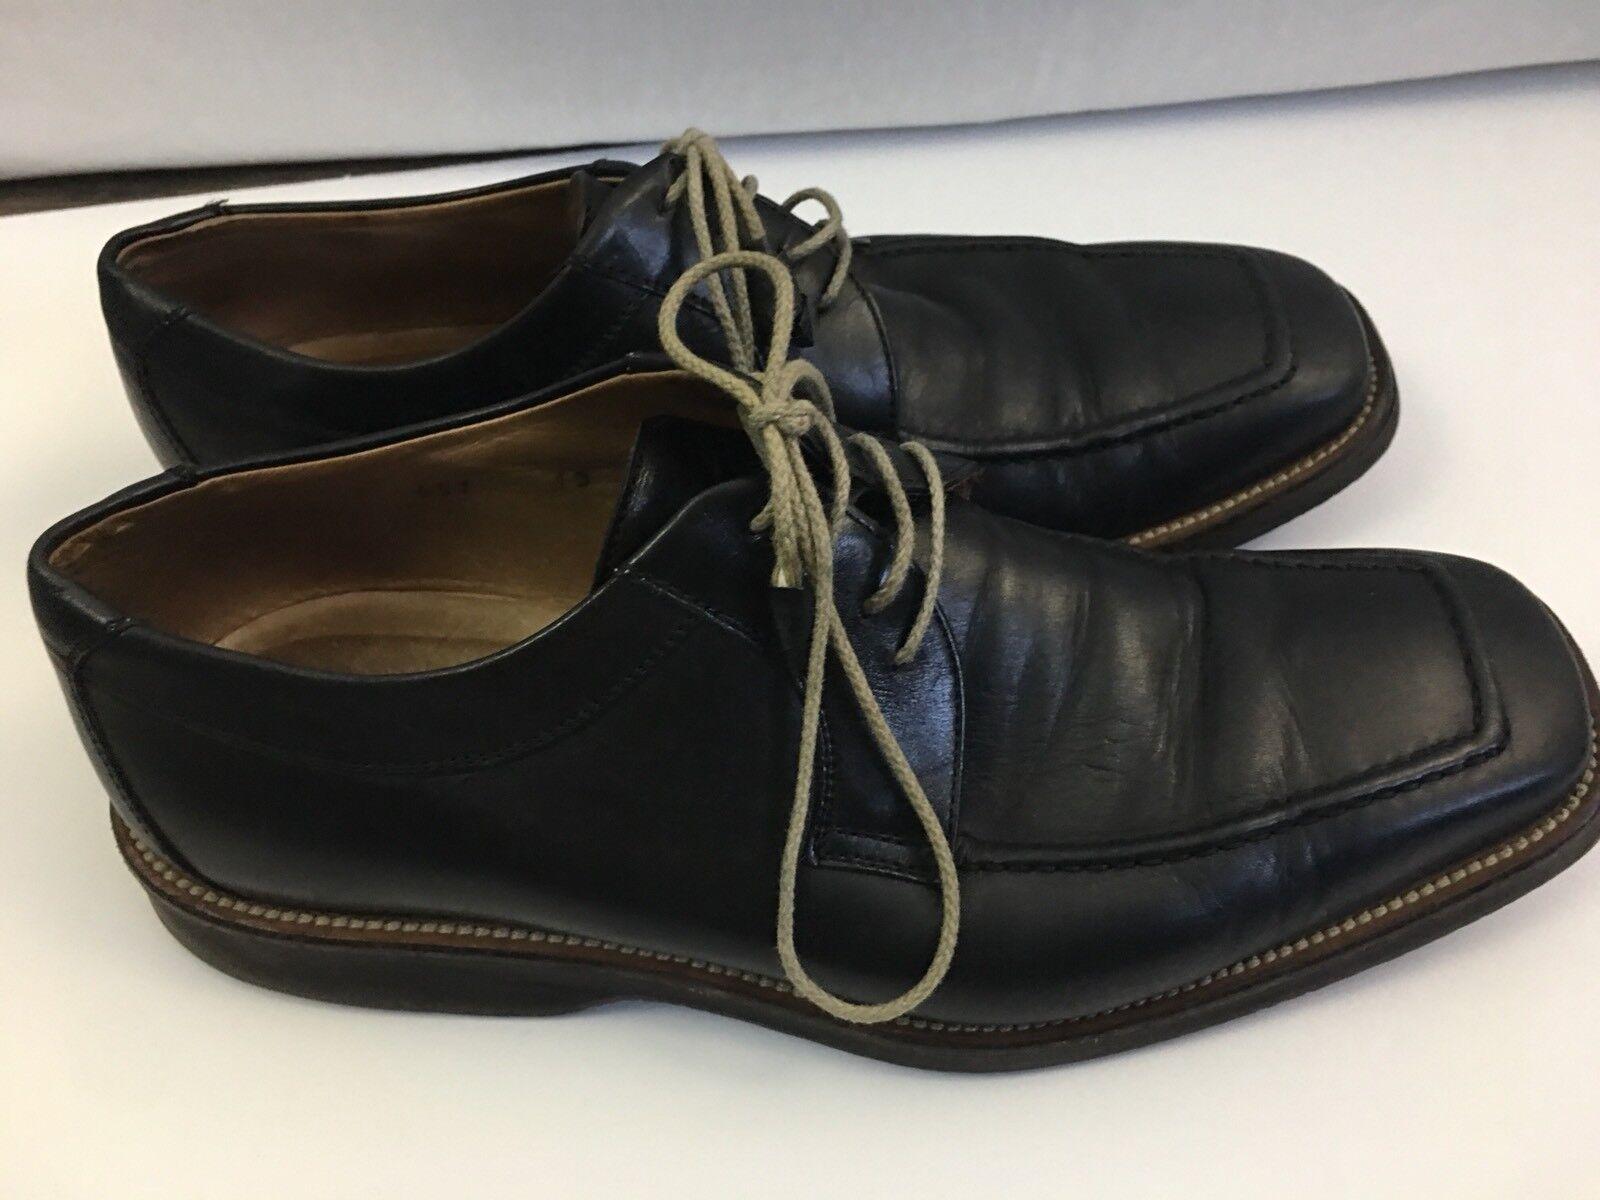 Ermenegildo Zegna Mens Dress Schuhe Square Toe Größe 10 schwarz Leather Rubber Soles